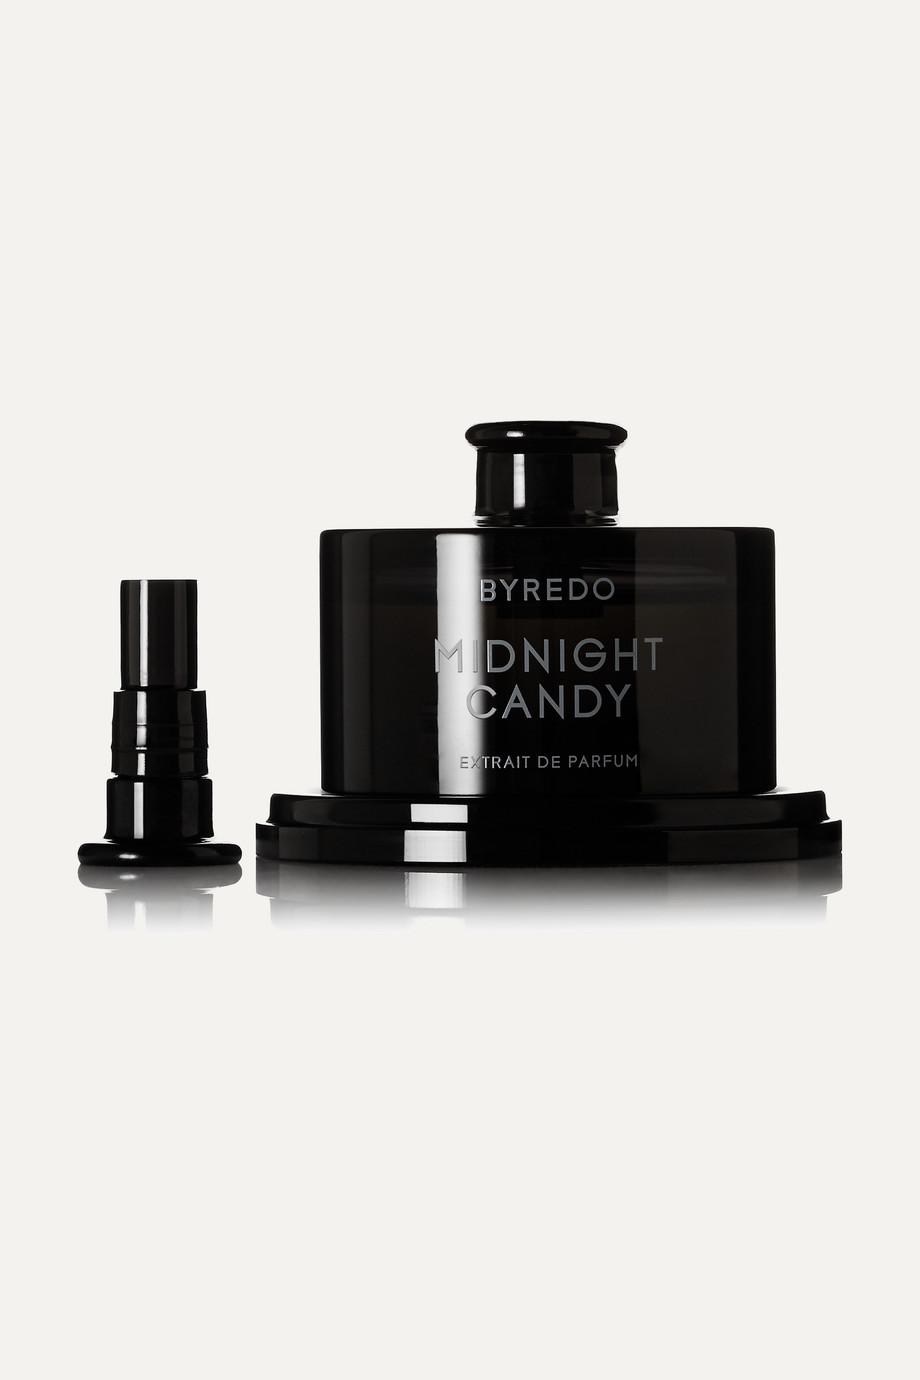 Byredo Midnight Candy – Karotte & Iris, 30 ml – Extrait de Parfum